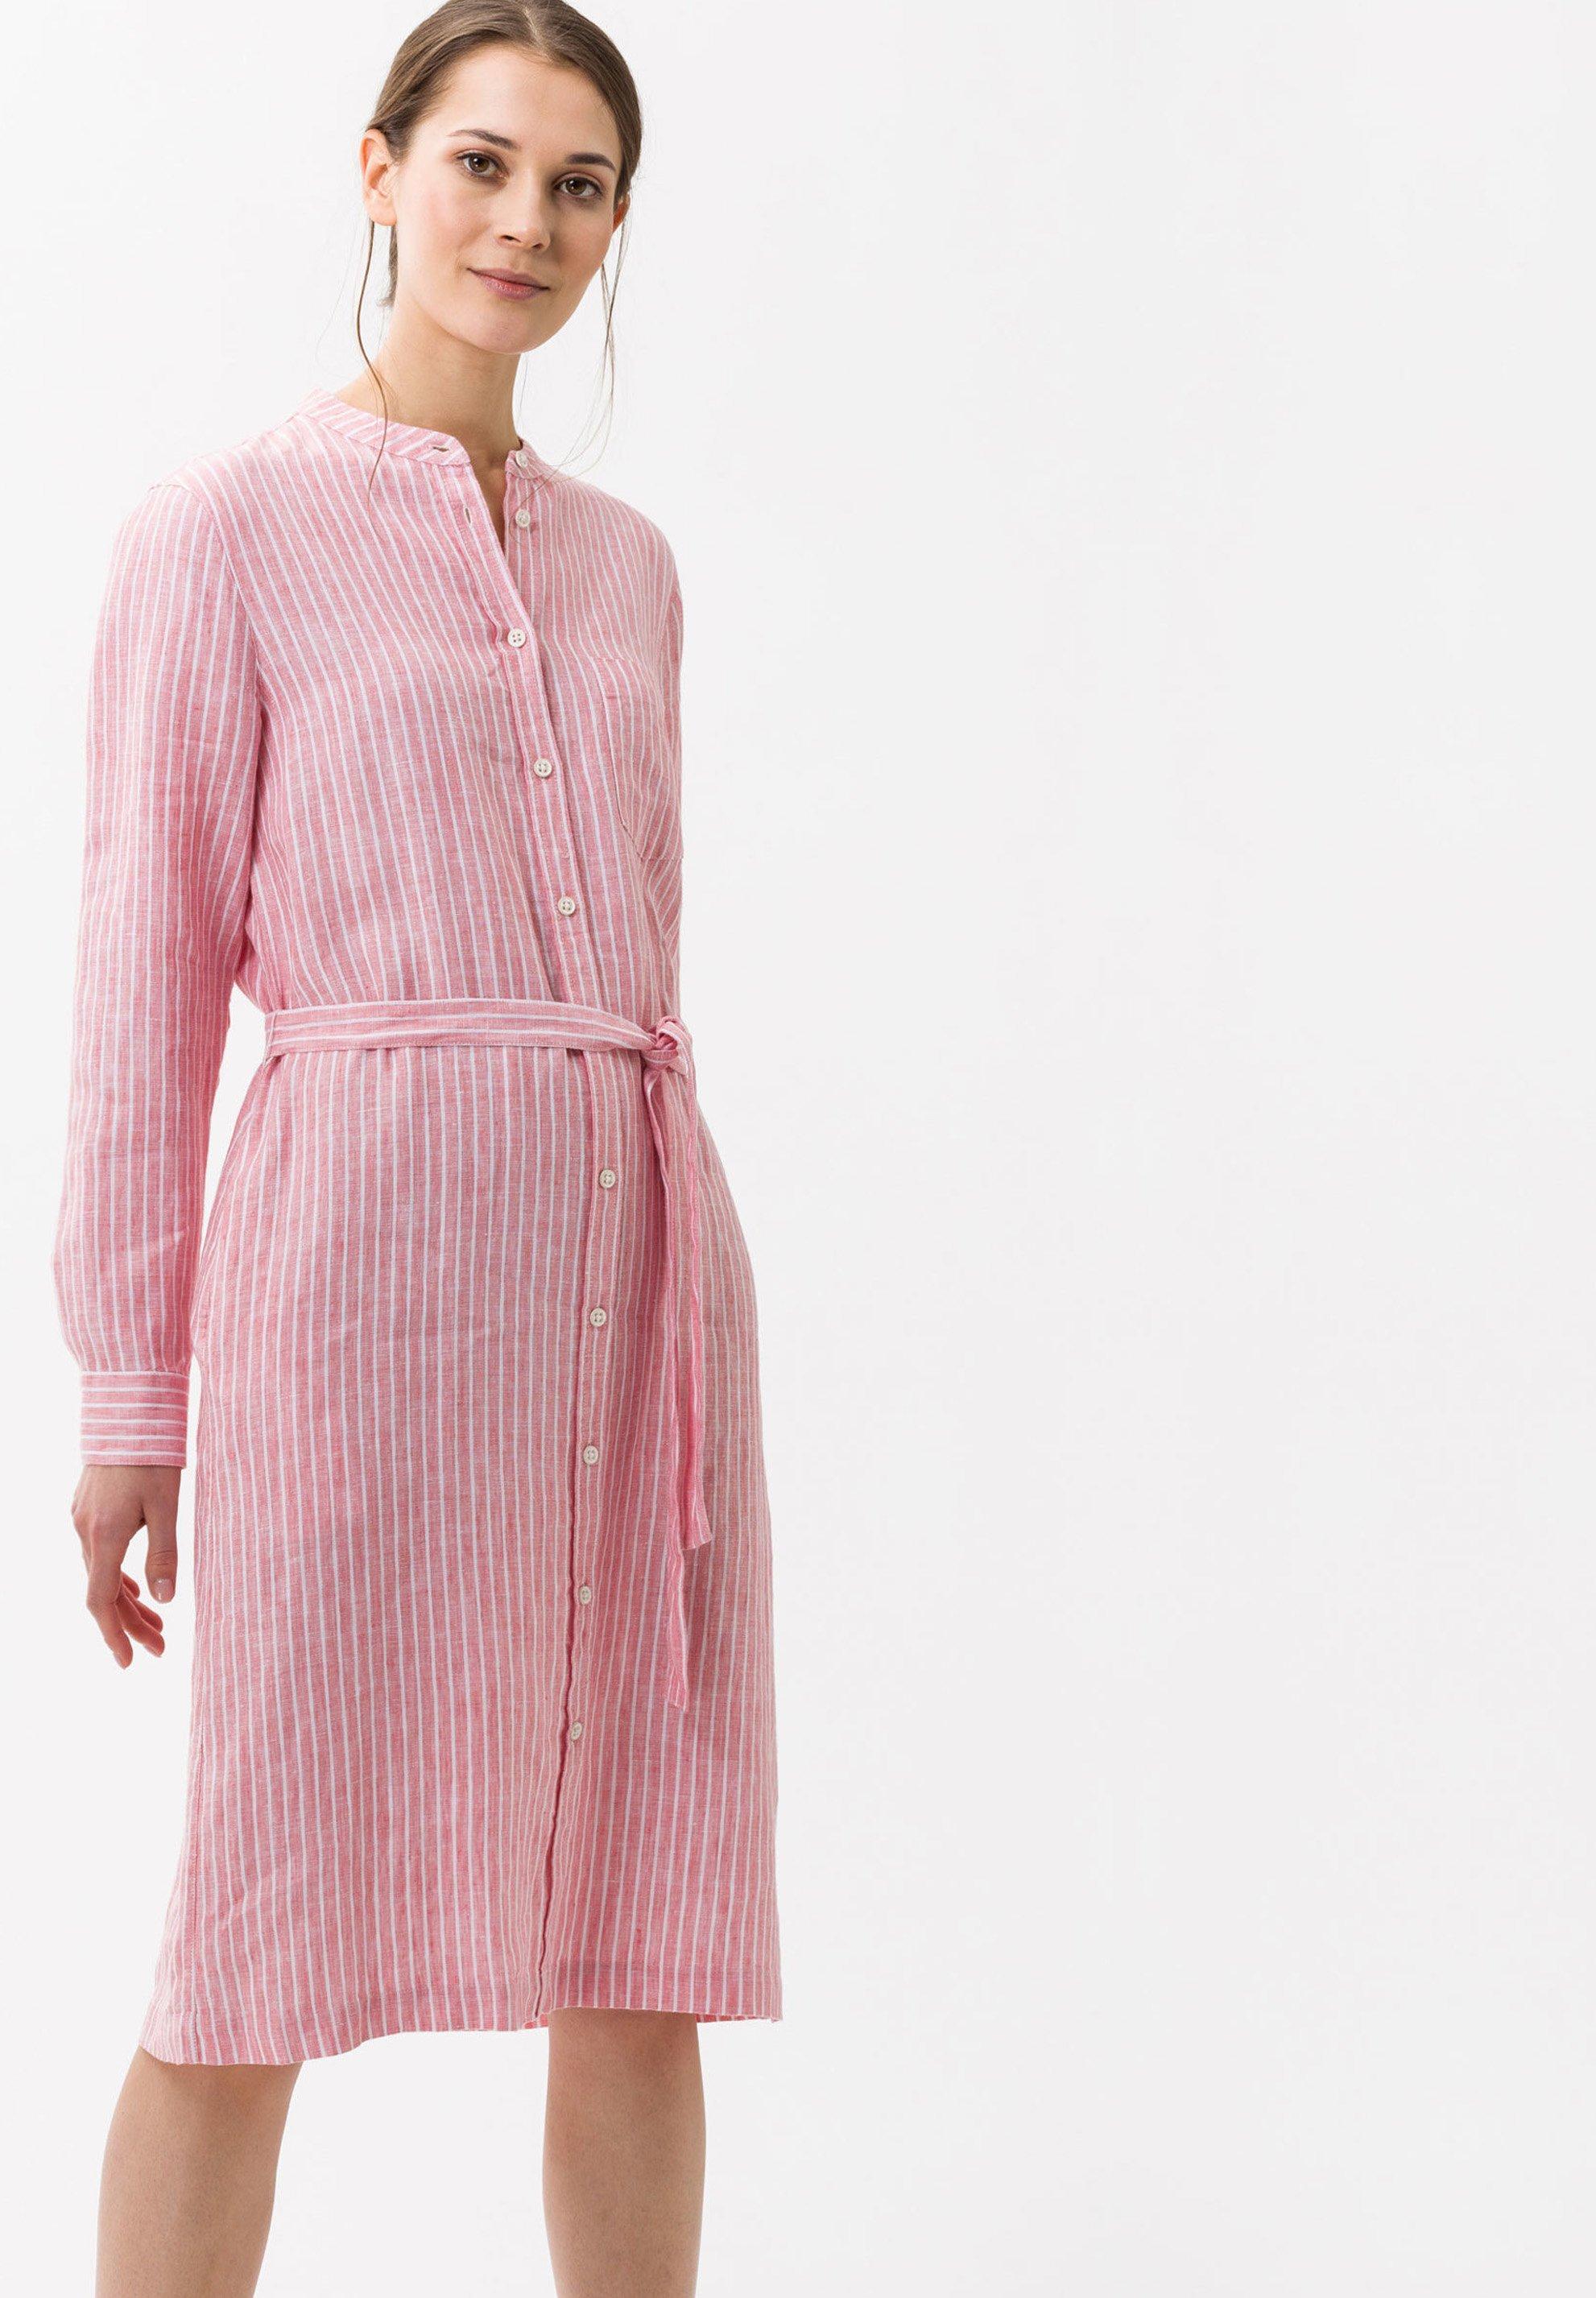 Femme STYLE GWENETH - Robe chemise